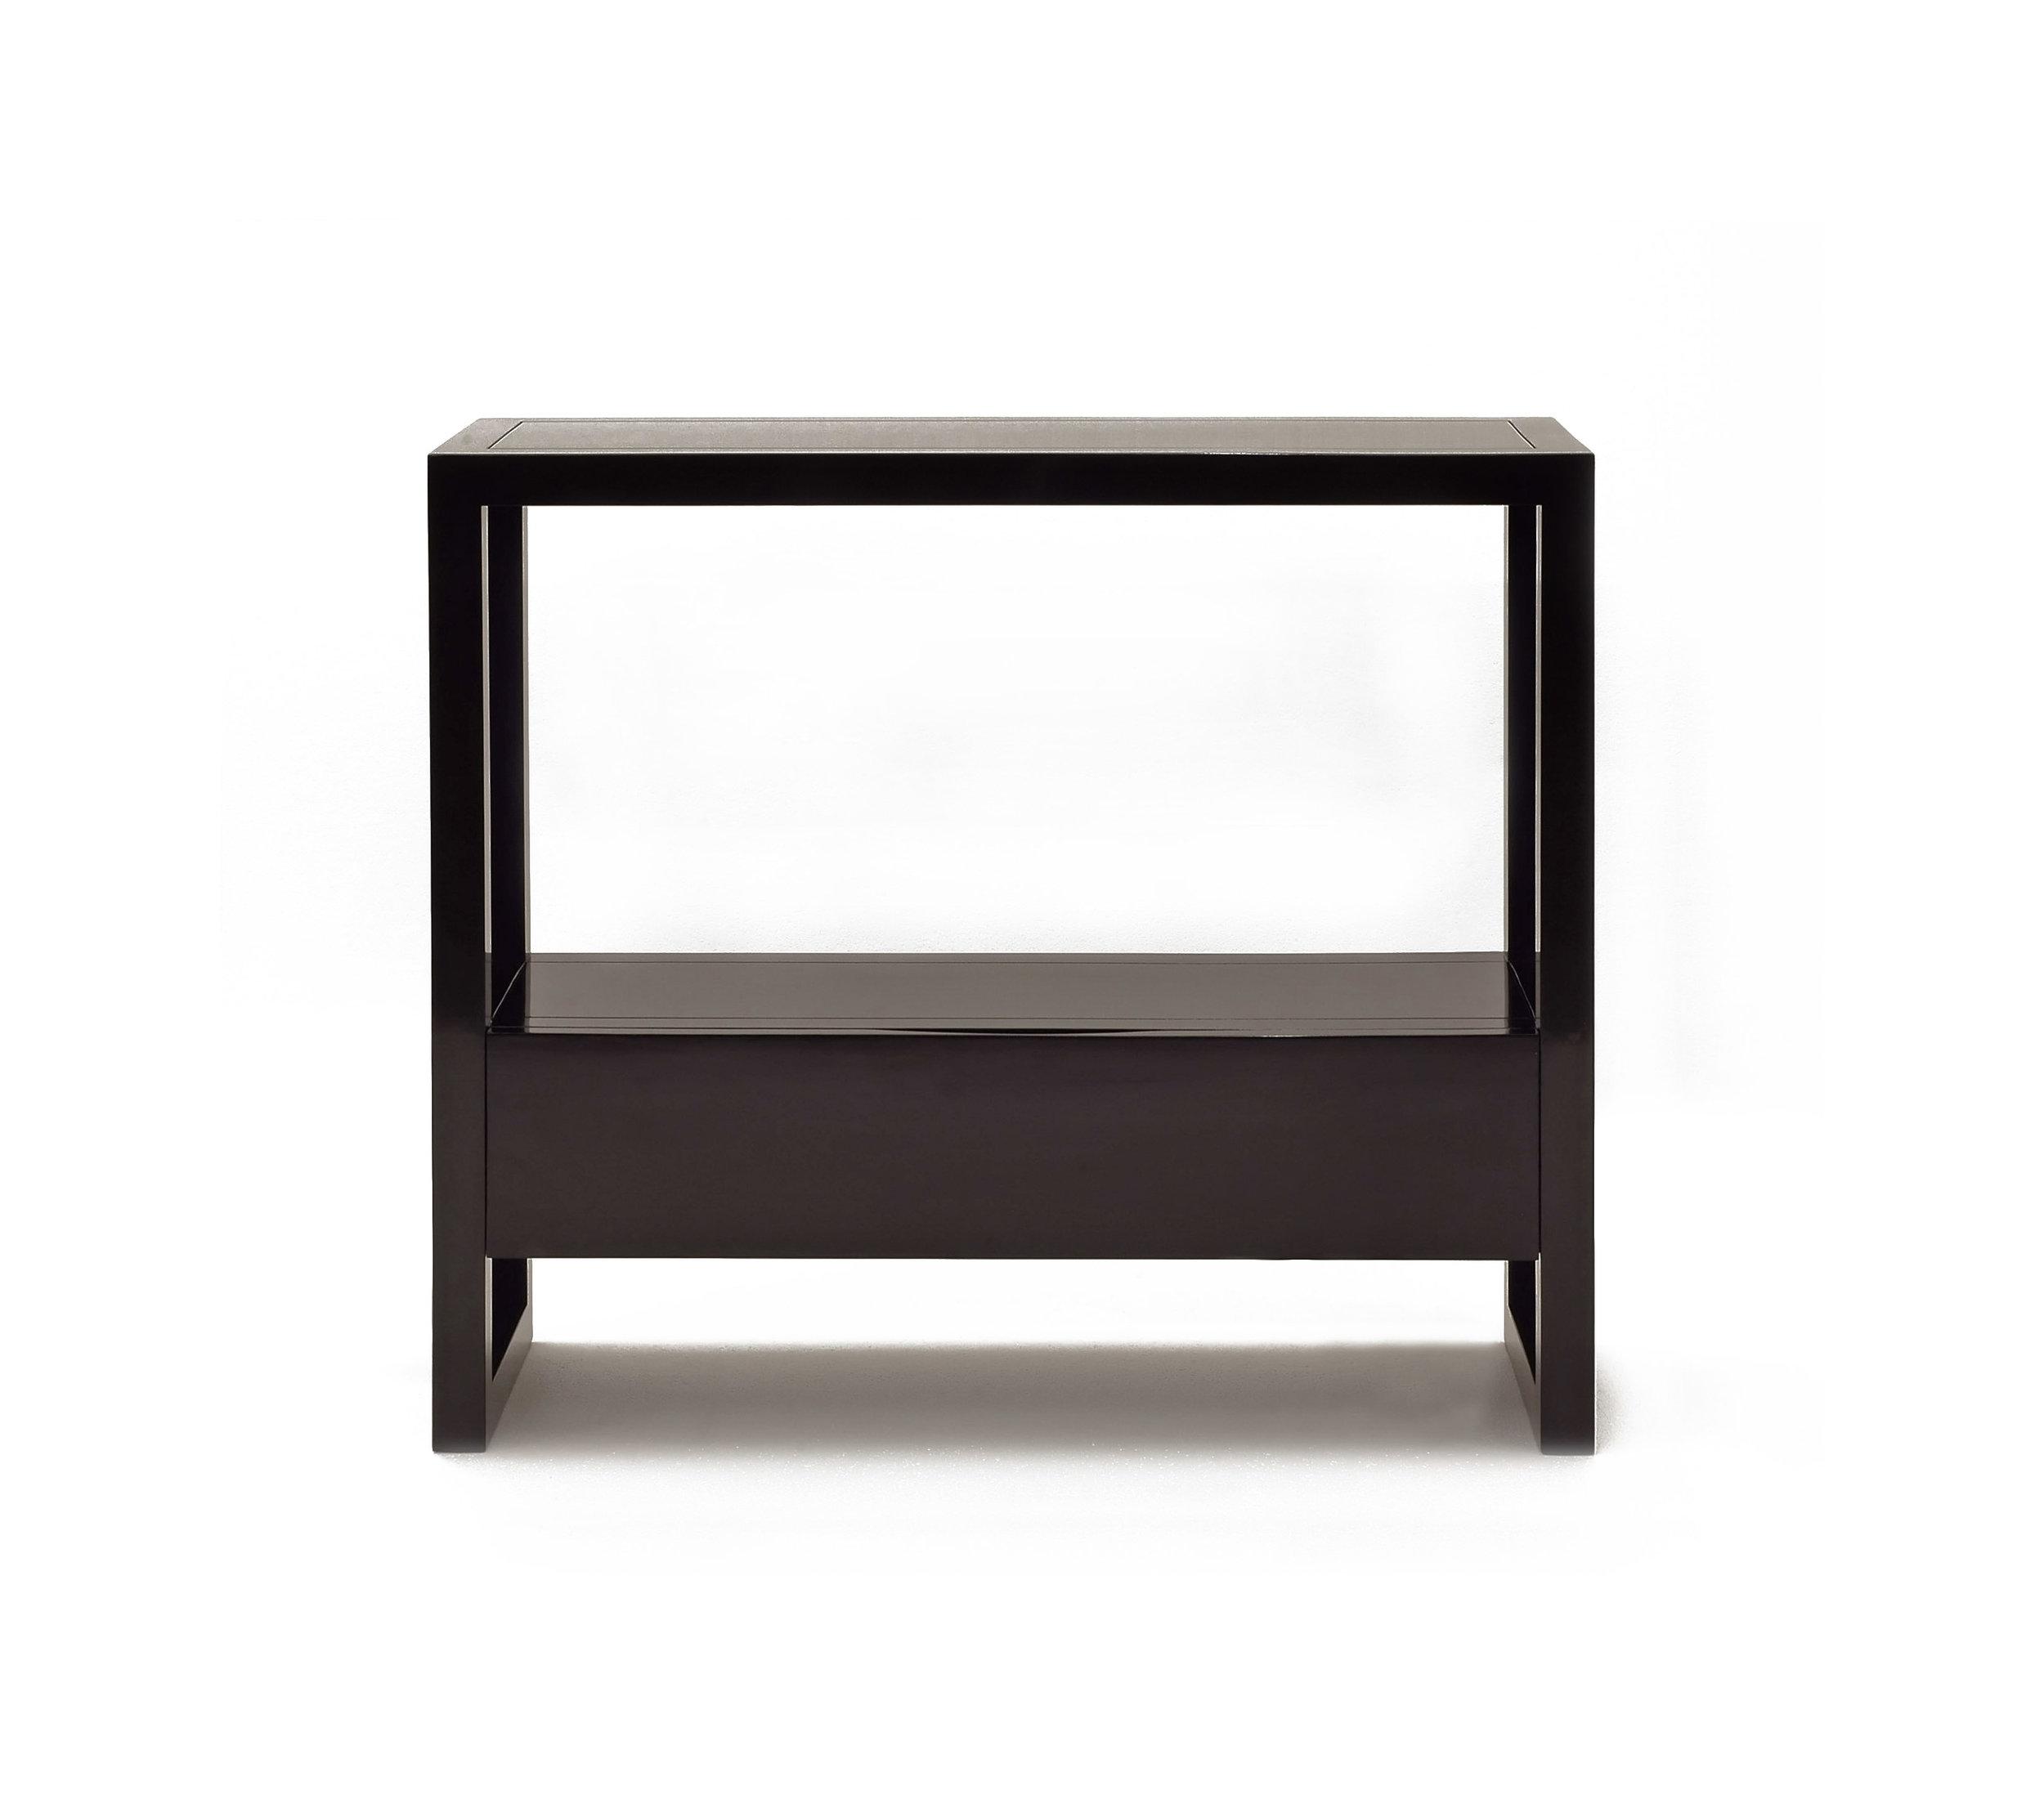 ....bespoke modern furniture   rosewood london : side table..特别定制现代家具   瑰丽伦敦酒店:条桌....